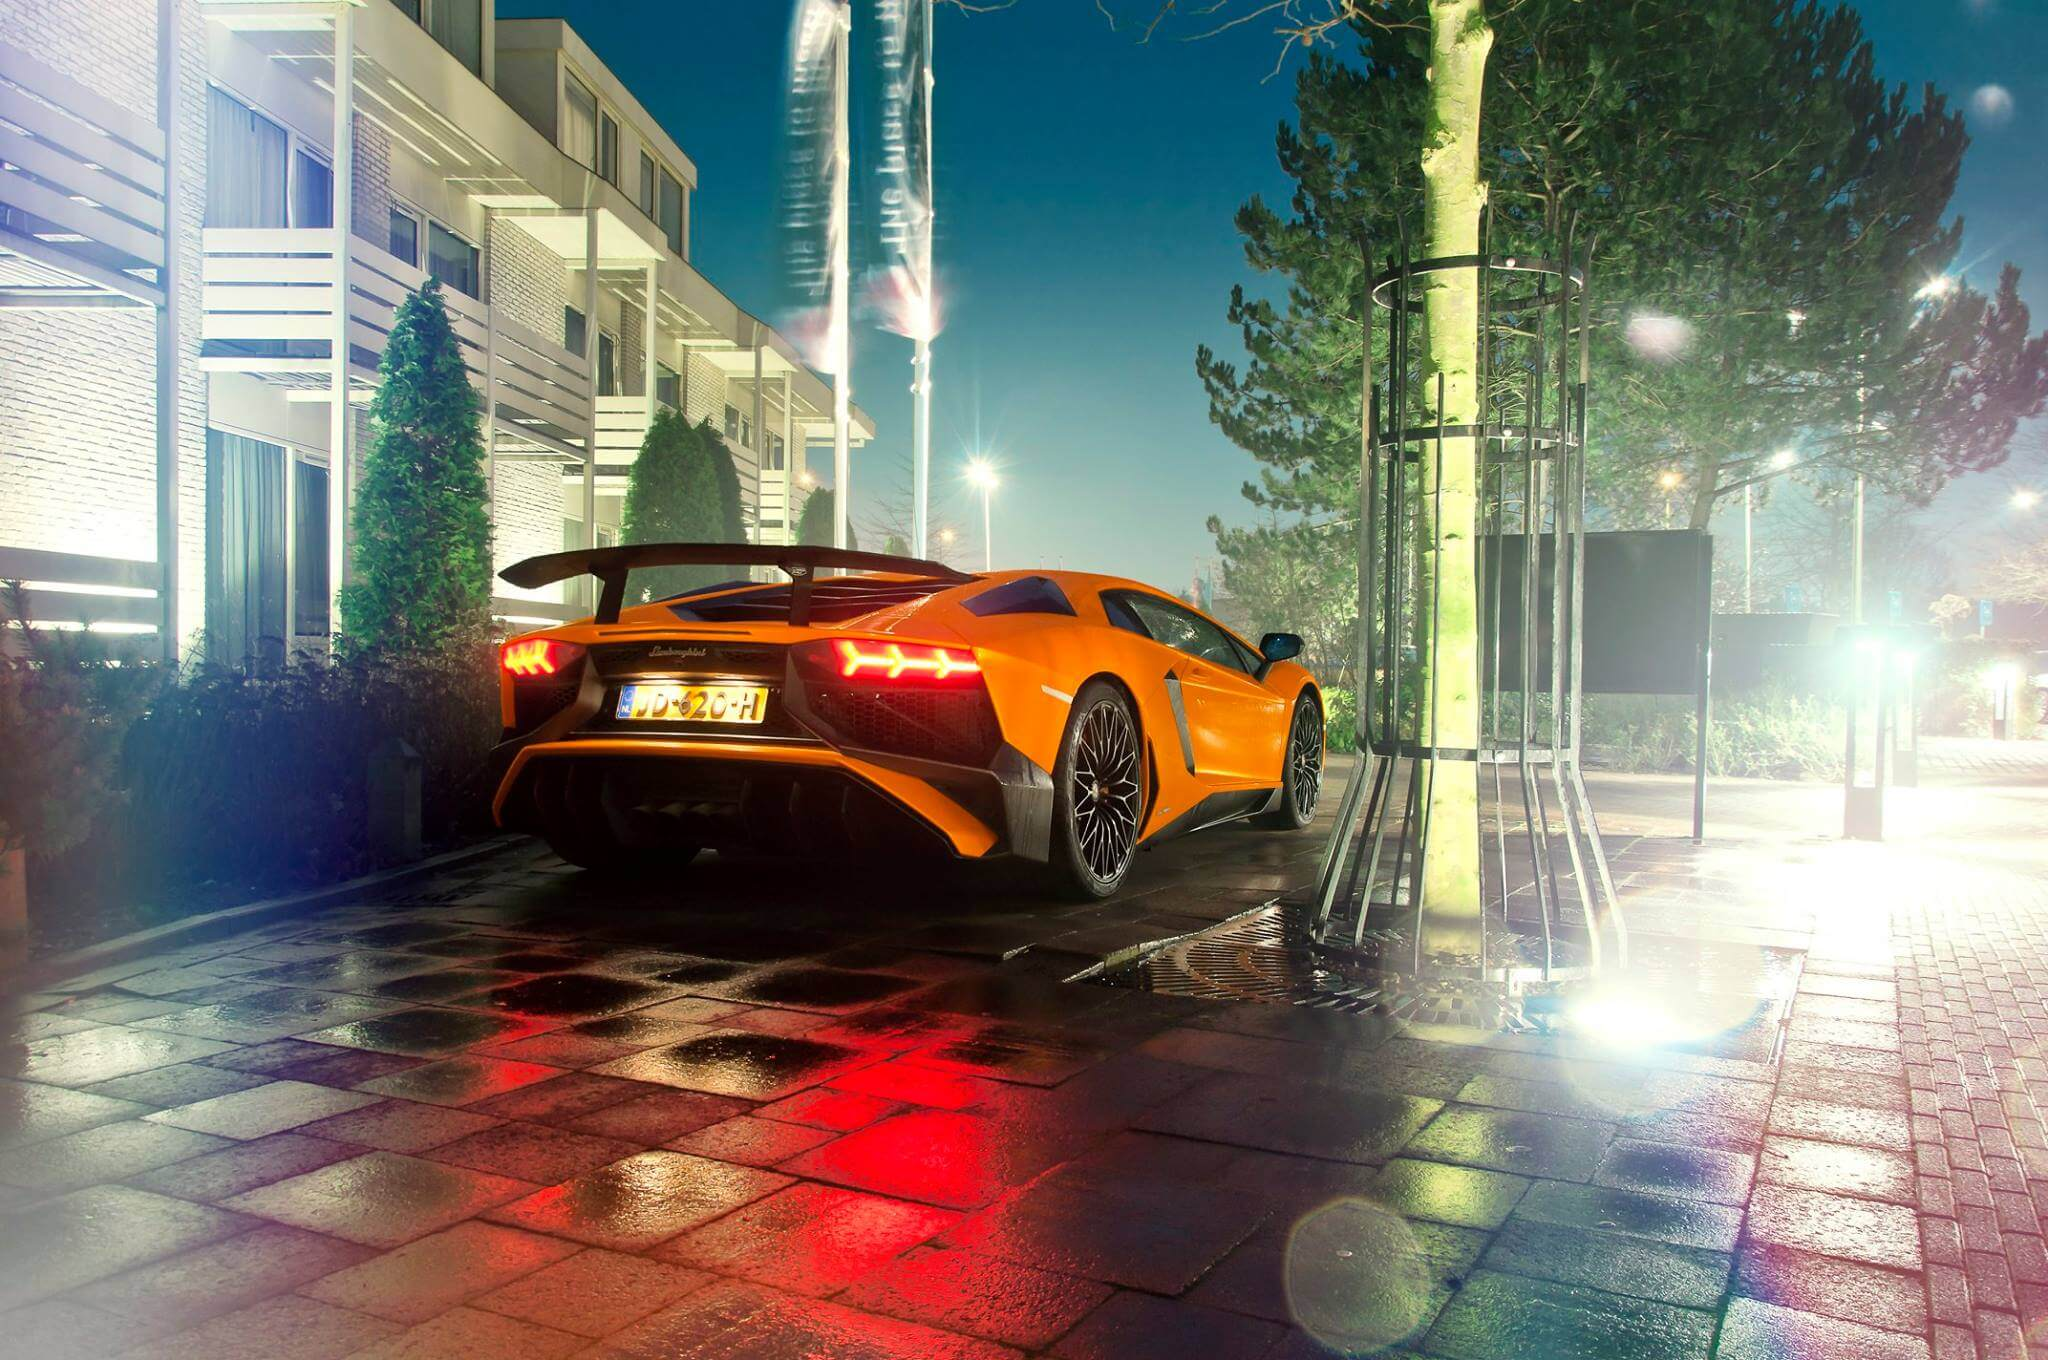 Lamborghini Aventador LP750-4 SuperVeloce - Hartvoorautos.nl